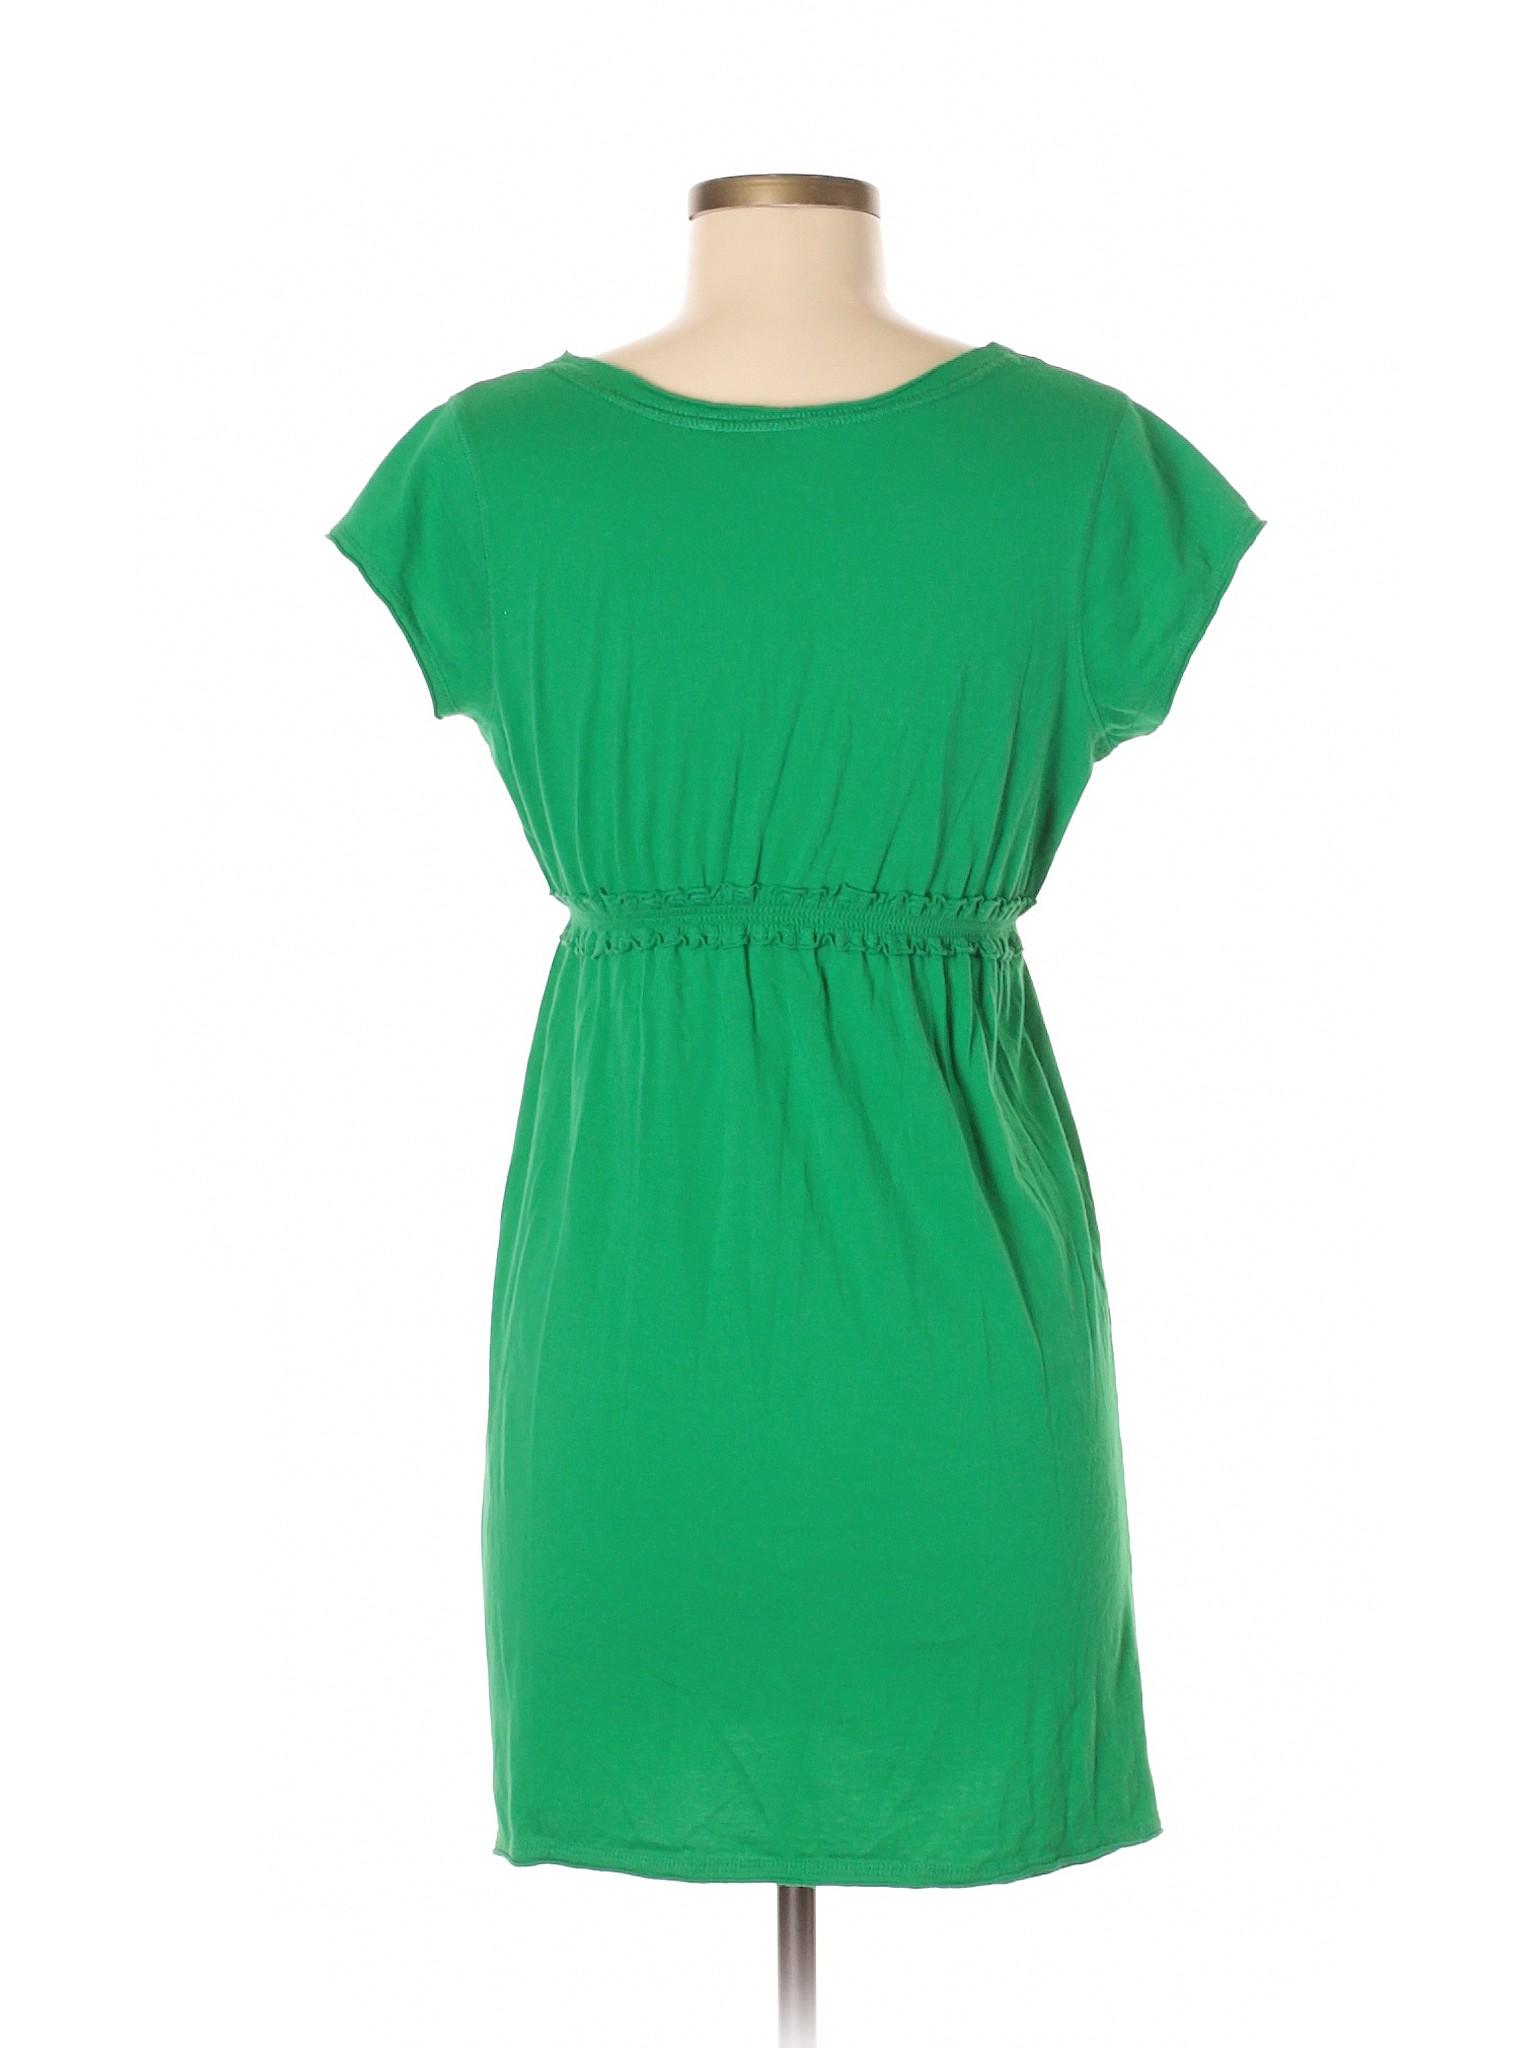 winter Vintage Boutique Dress Girl Casual RaqB07x